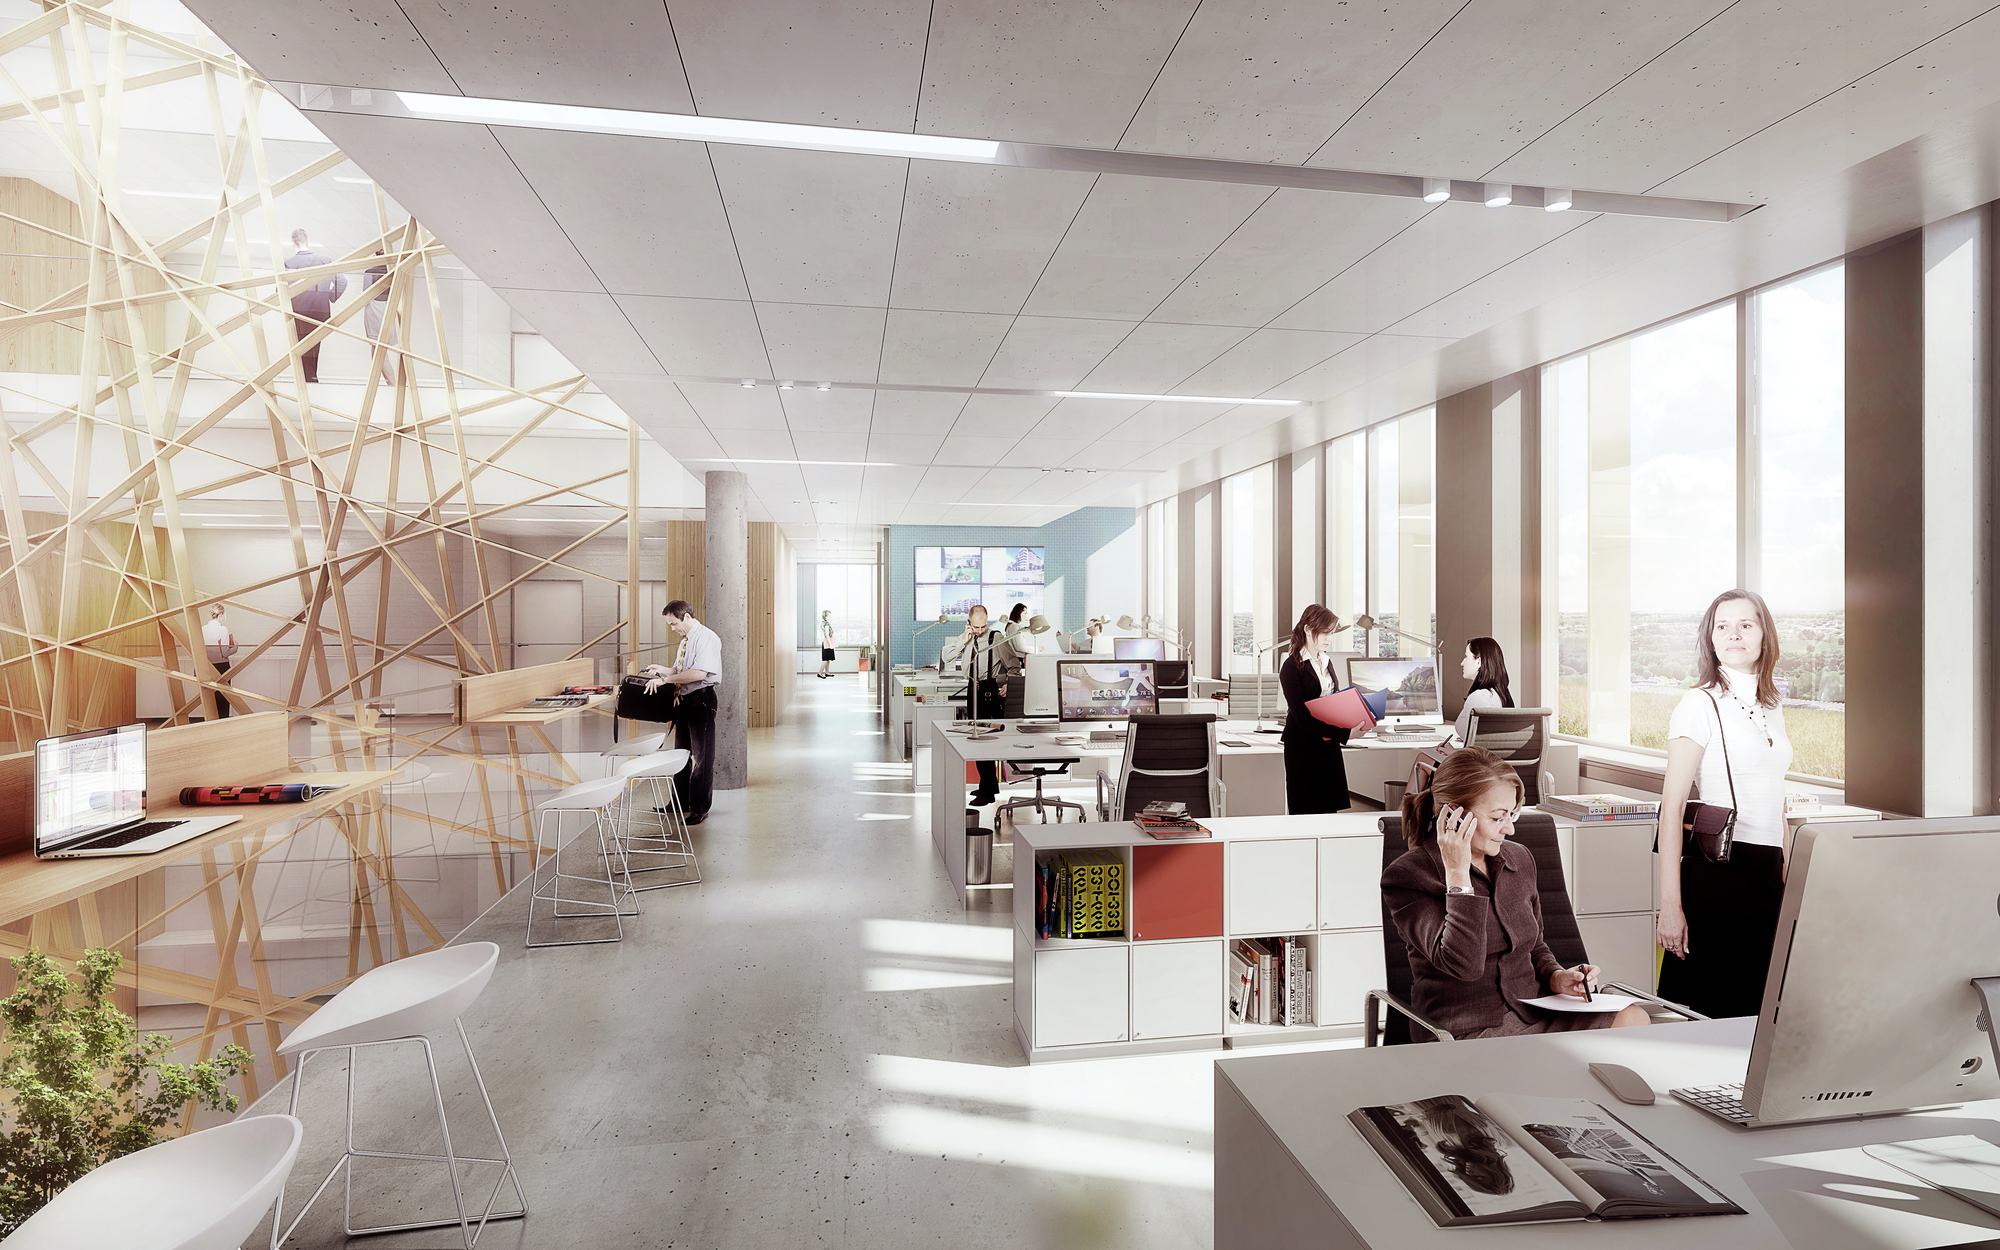 Galeria De Arkitema Projeta Edif Cio De Escrit Rios Para A